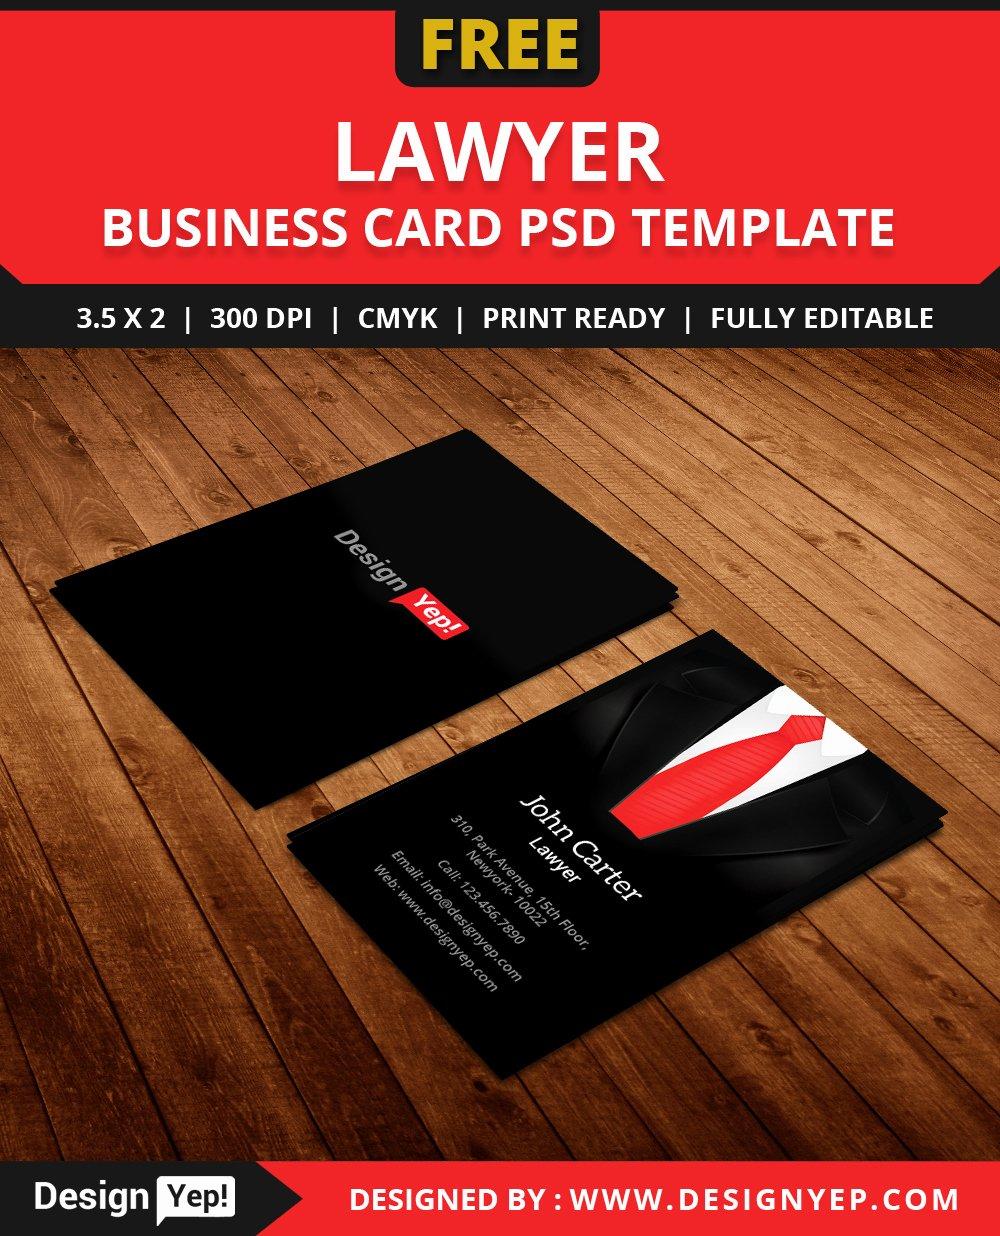 Lawyer Business Card Template Beautiful Free Lawyer Business Card Template Psd Designyep